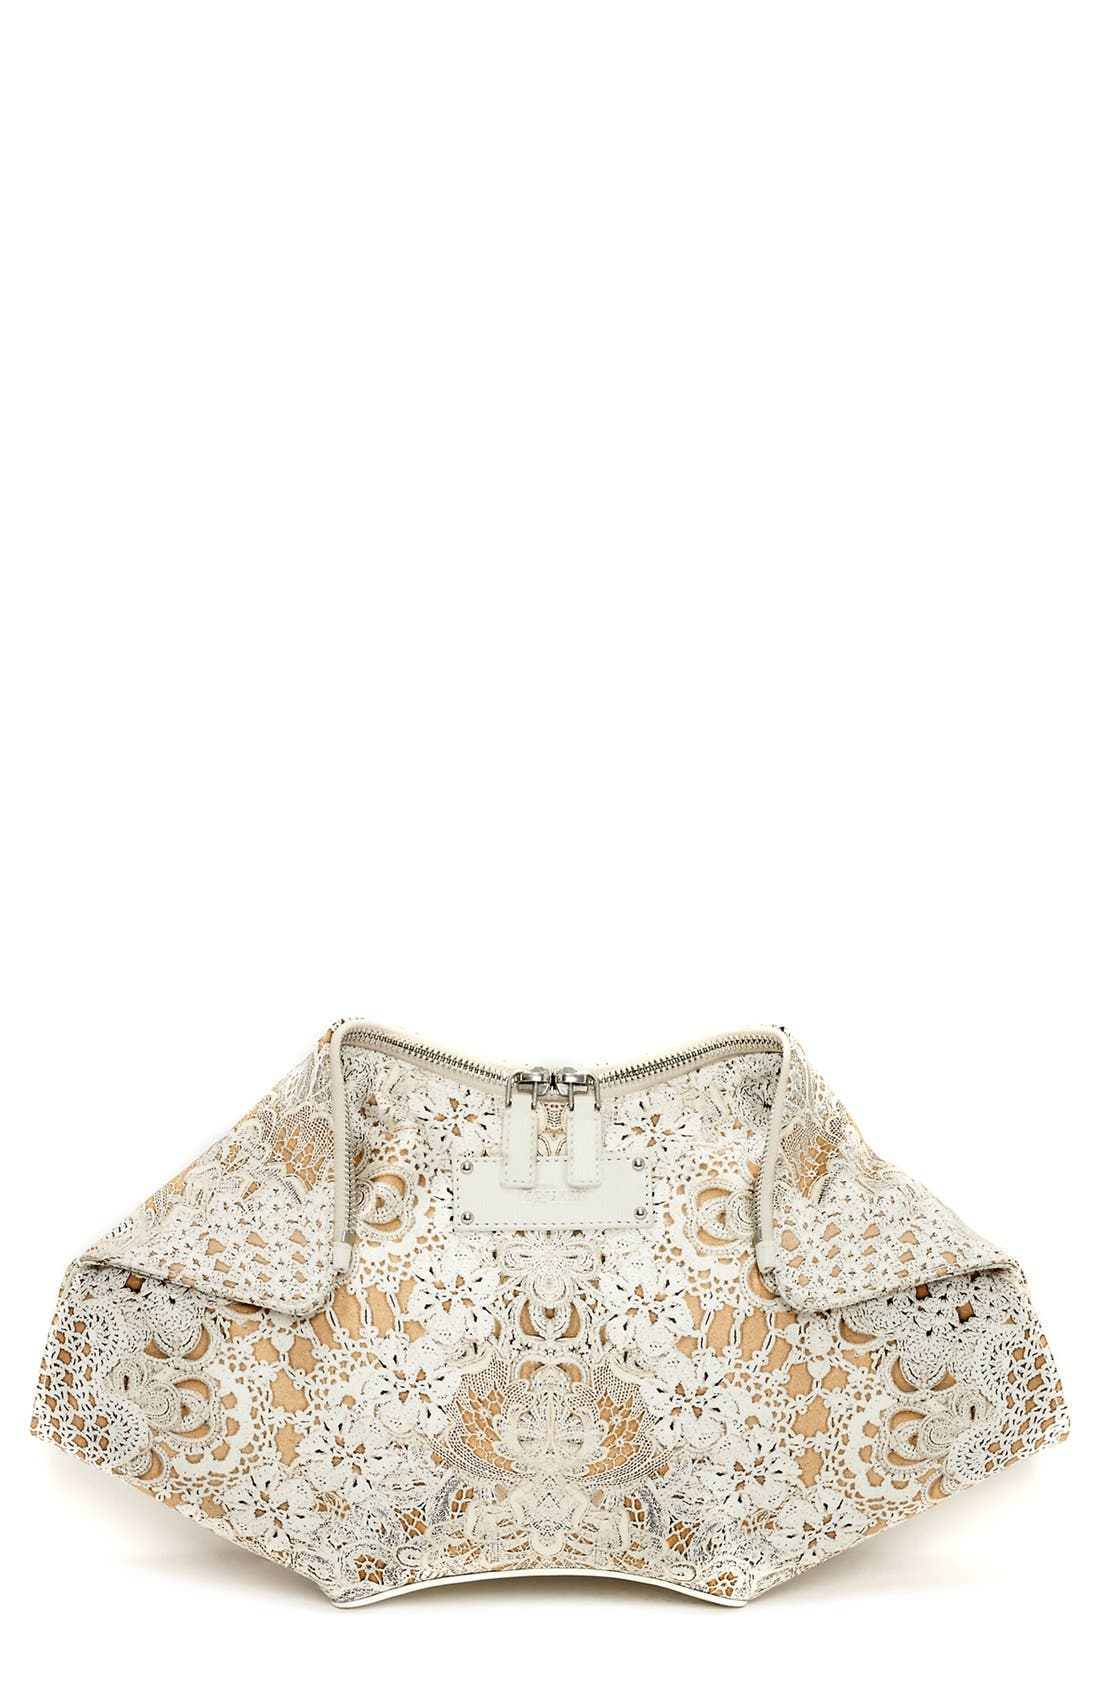 Alternate Image 1 Selected - Alexander McQueen 'De Manta' Silk & Leather Clutch